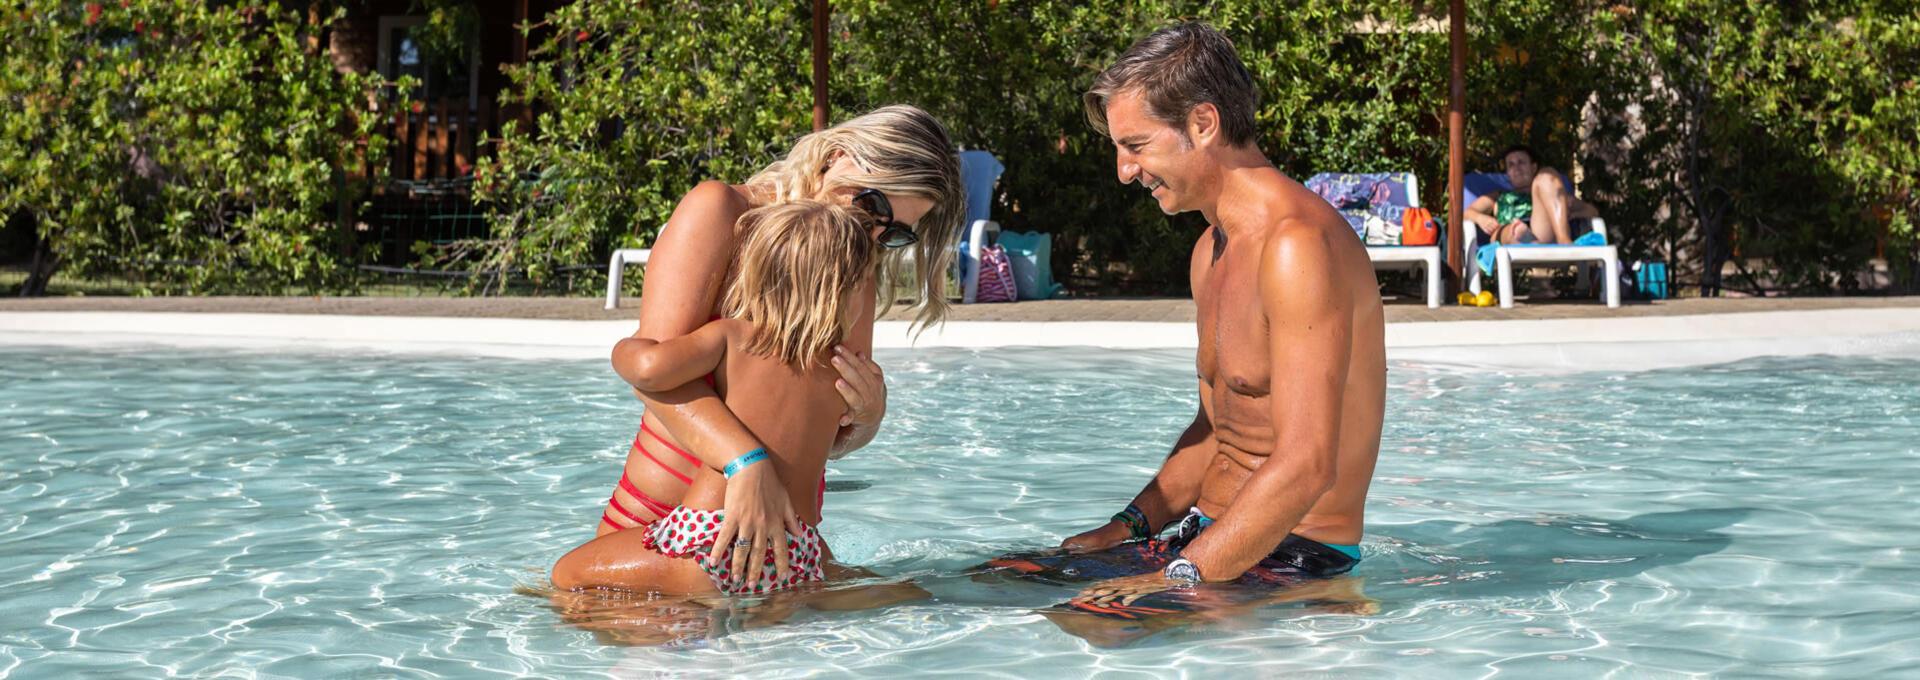 4mori fr village-touristique-avec-piscine-sardaigne 019